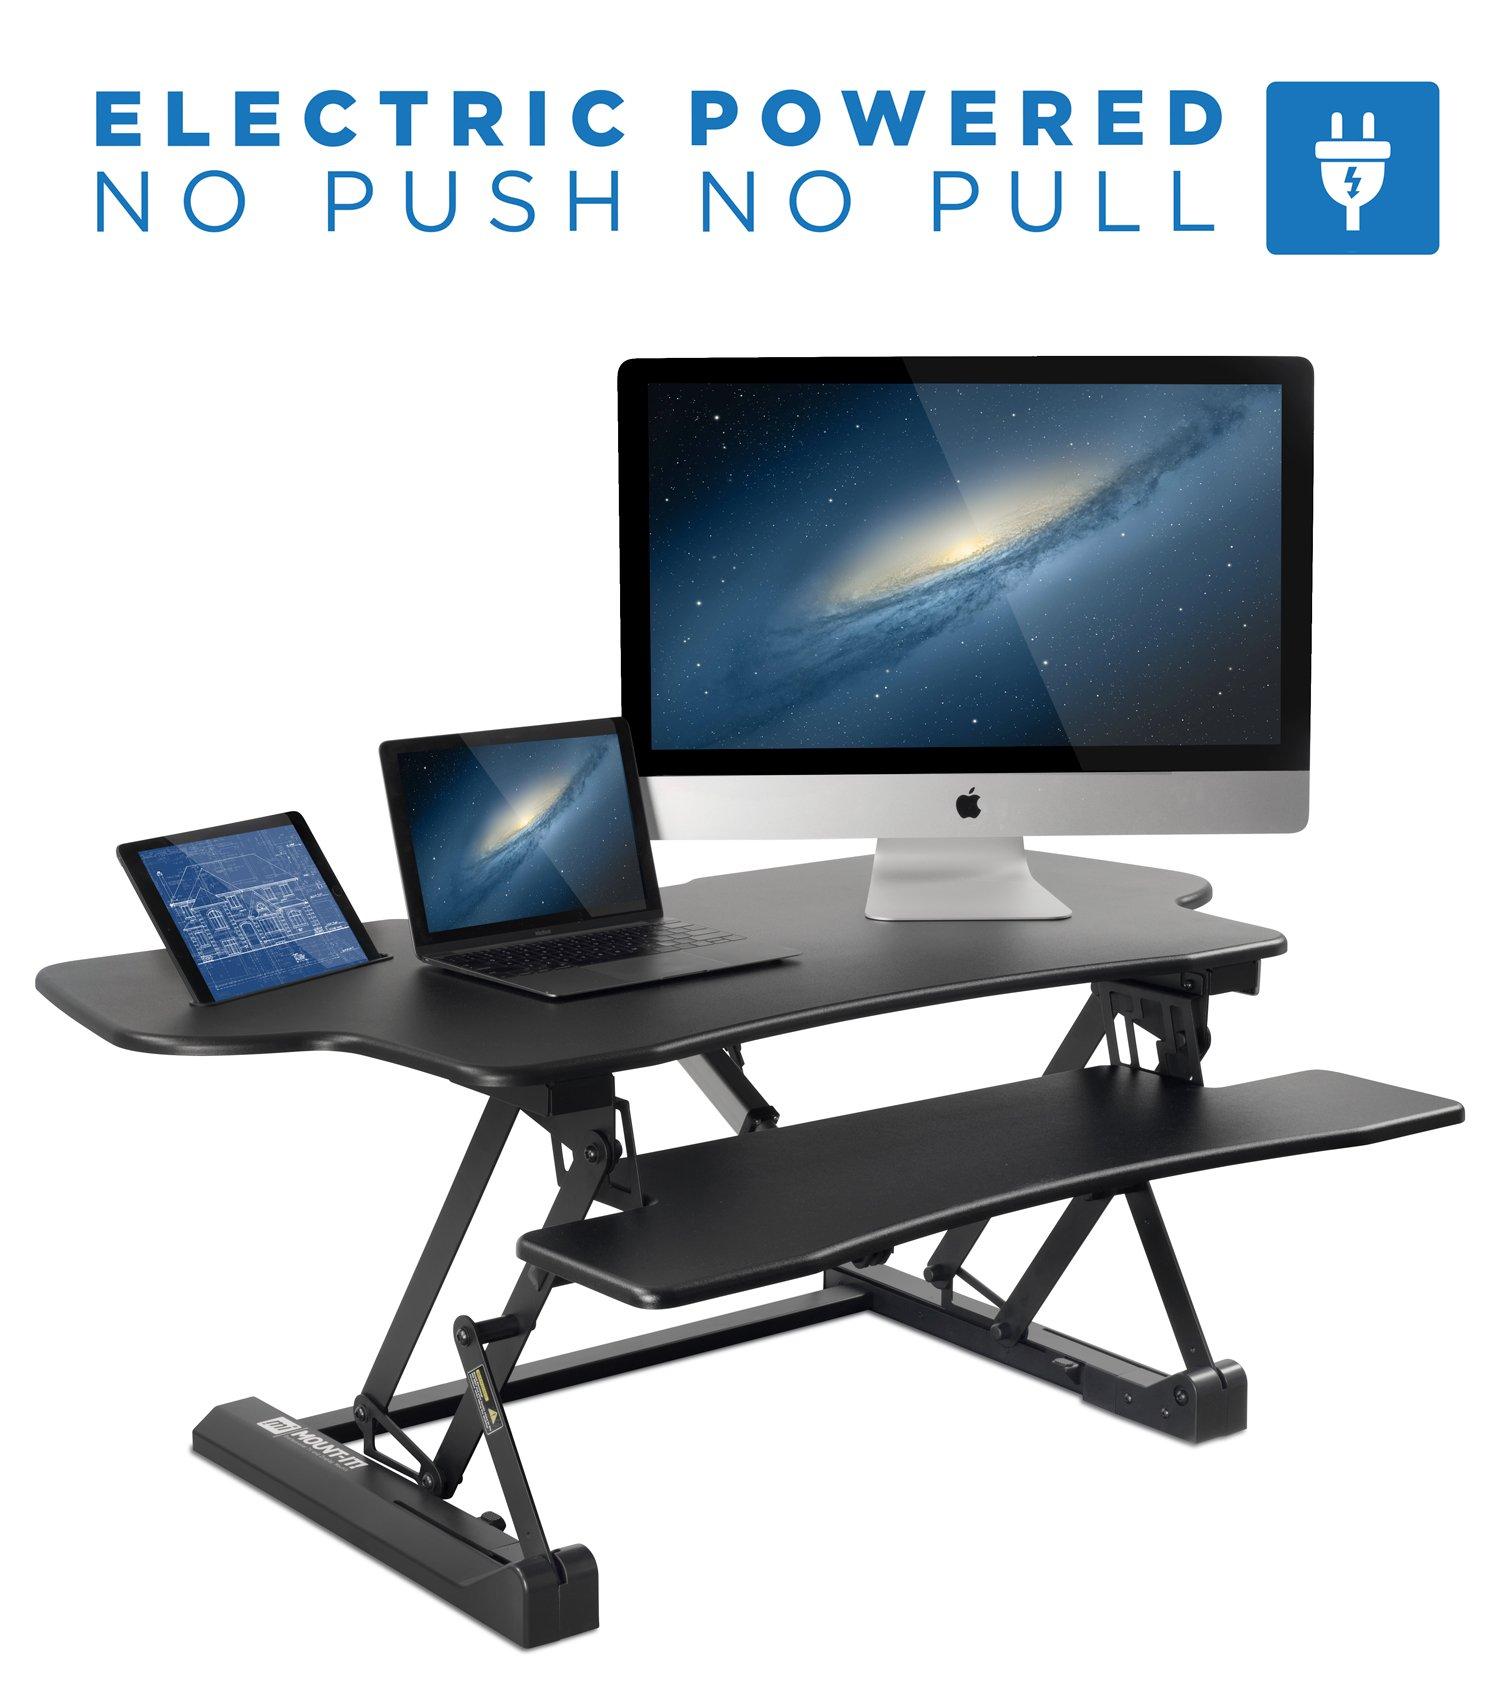 Mount-It! Electric Standing Desk Converter, Motorized Sit Stand Desk with Built in USB Port, Ergonomic Height Adjustable Workstation, Black (MI-7962)